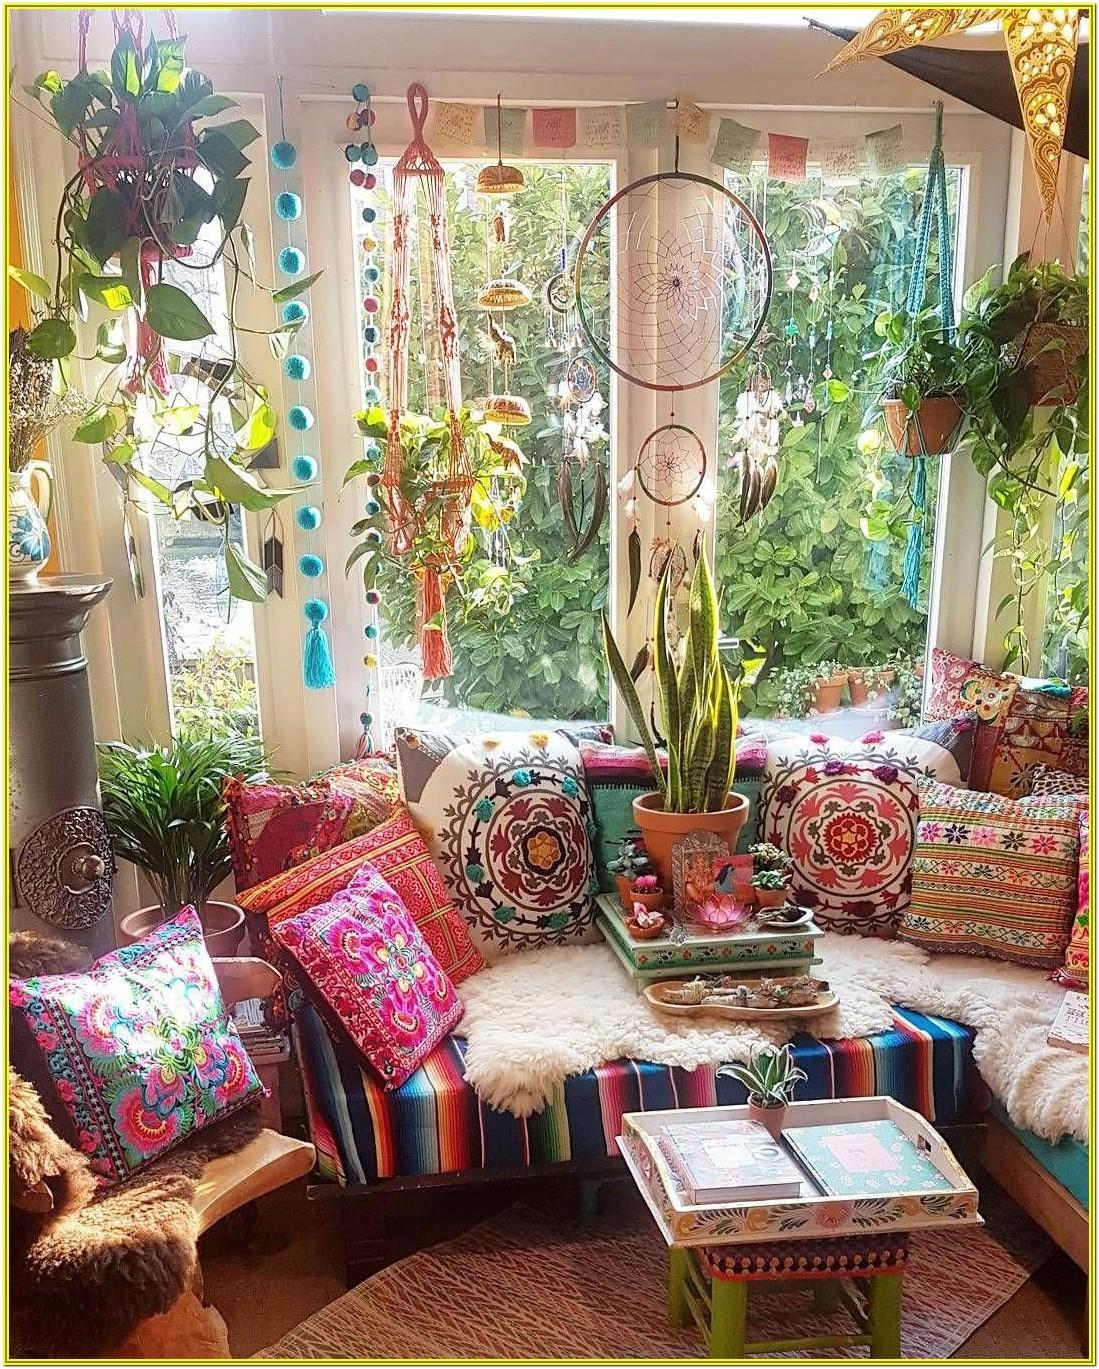 Boho Chic Shabby Chic Boho Chic Boho Living Room Ideas